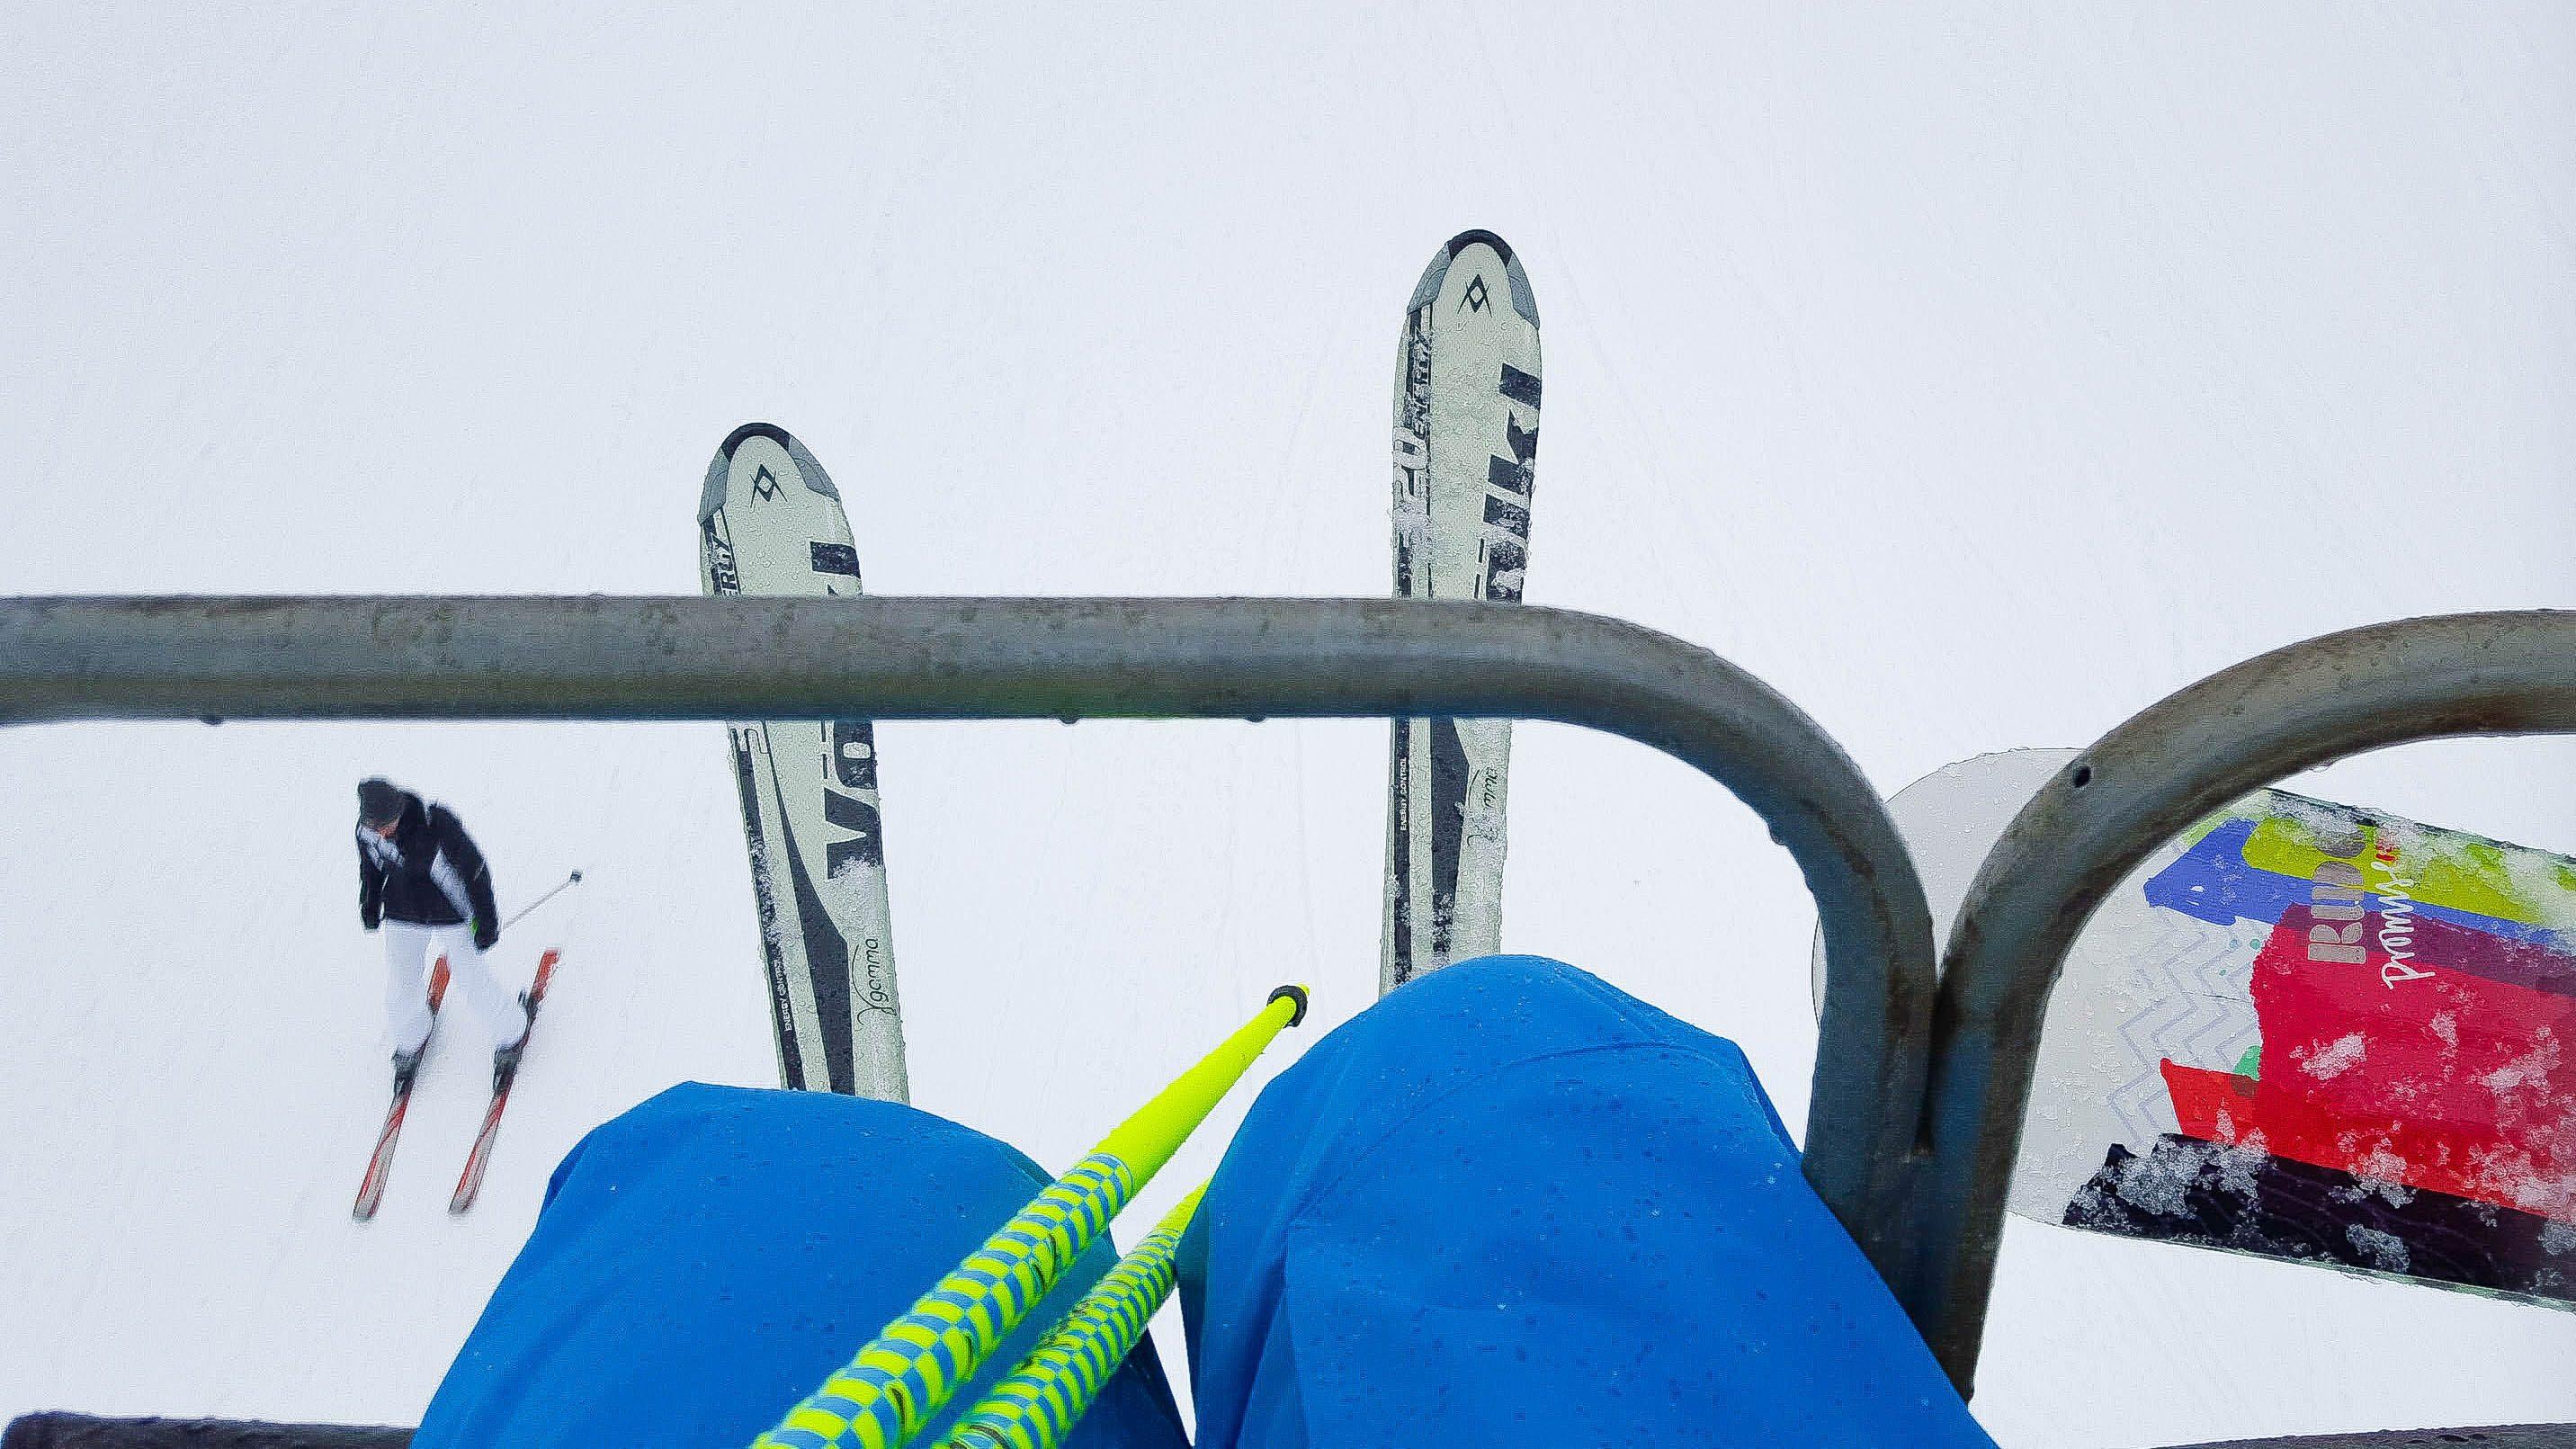 Beginner's Guide to Skiing on Big Moose Mountain at Big Squaw Resort